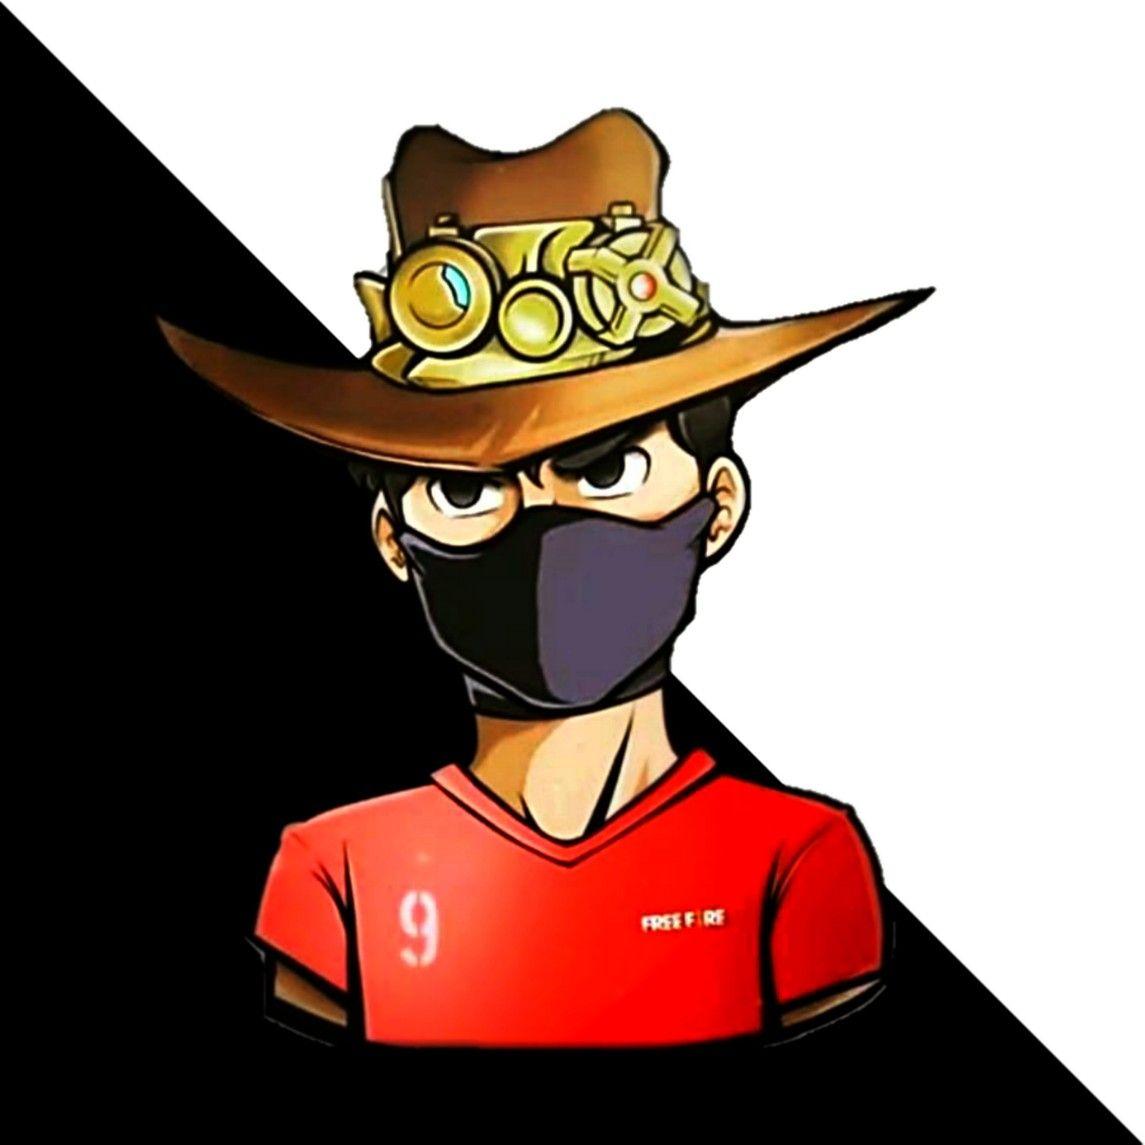 Free Fire Cartoon Photo Desenho De Gato Preto Logotipos Retro Desenho De Ninja